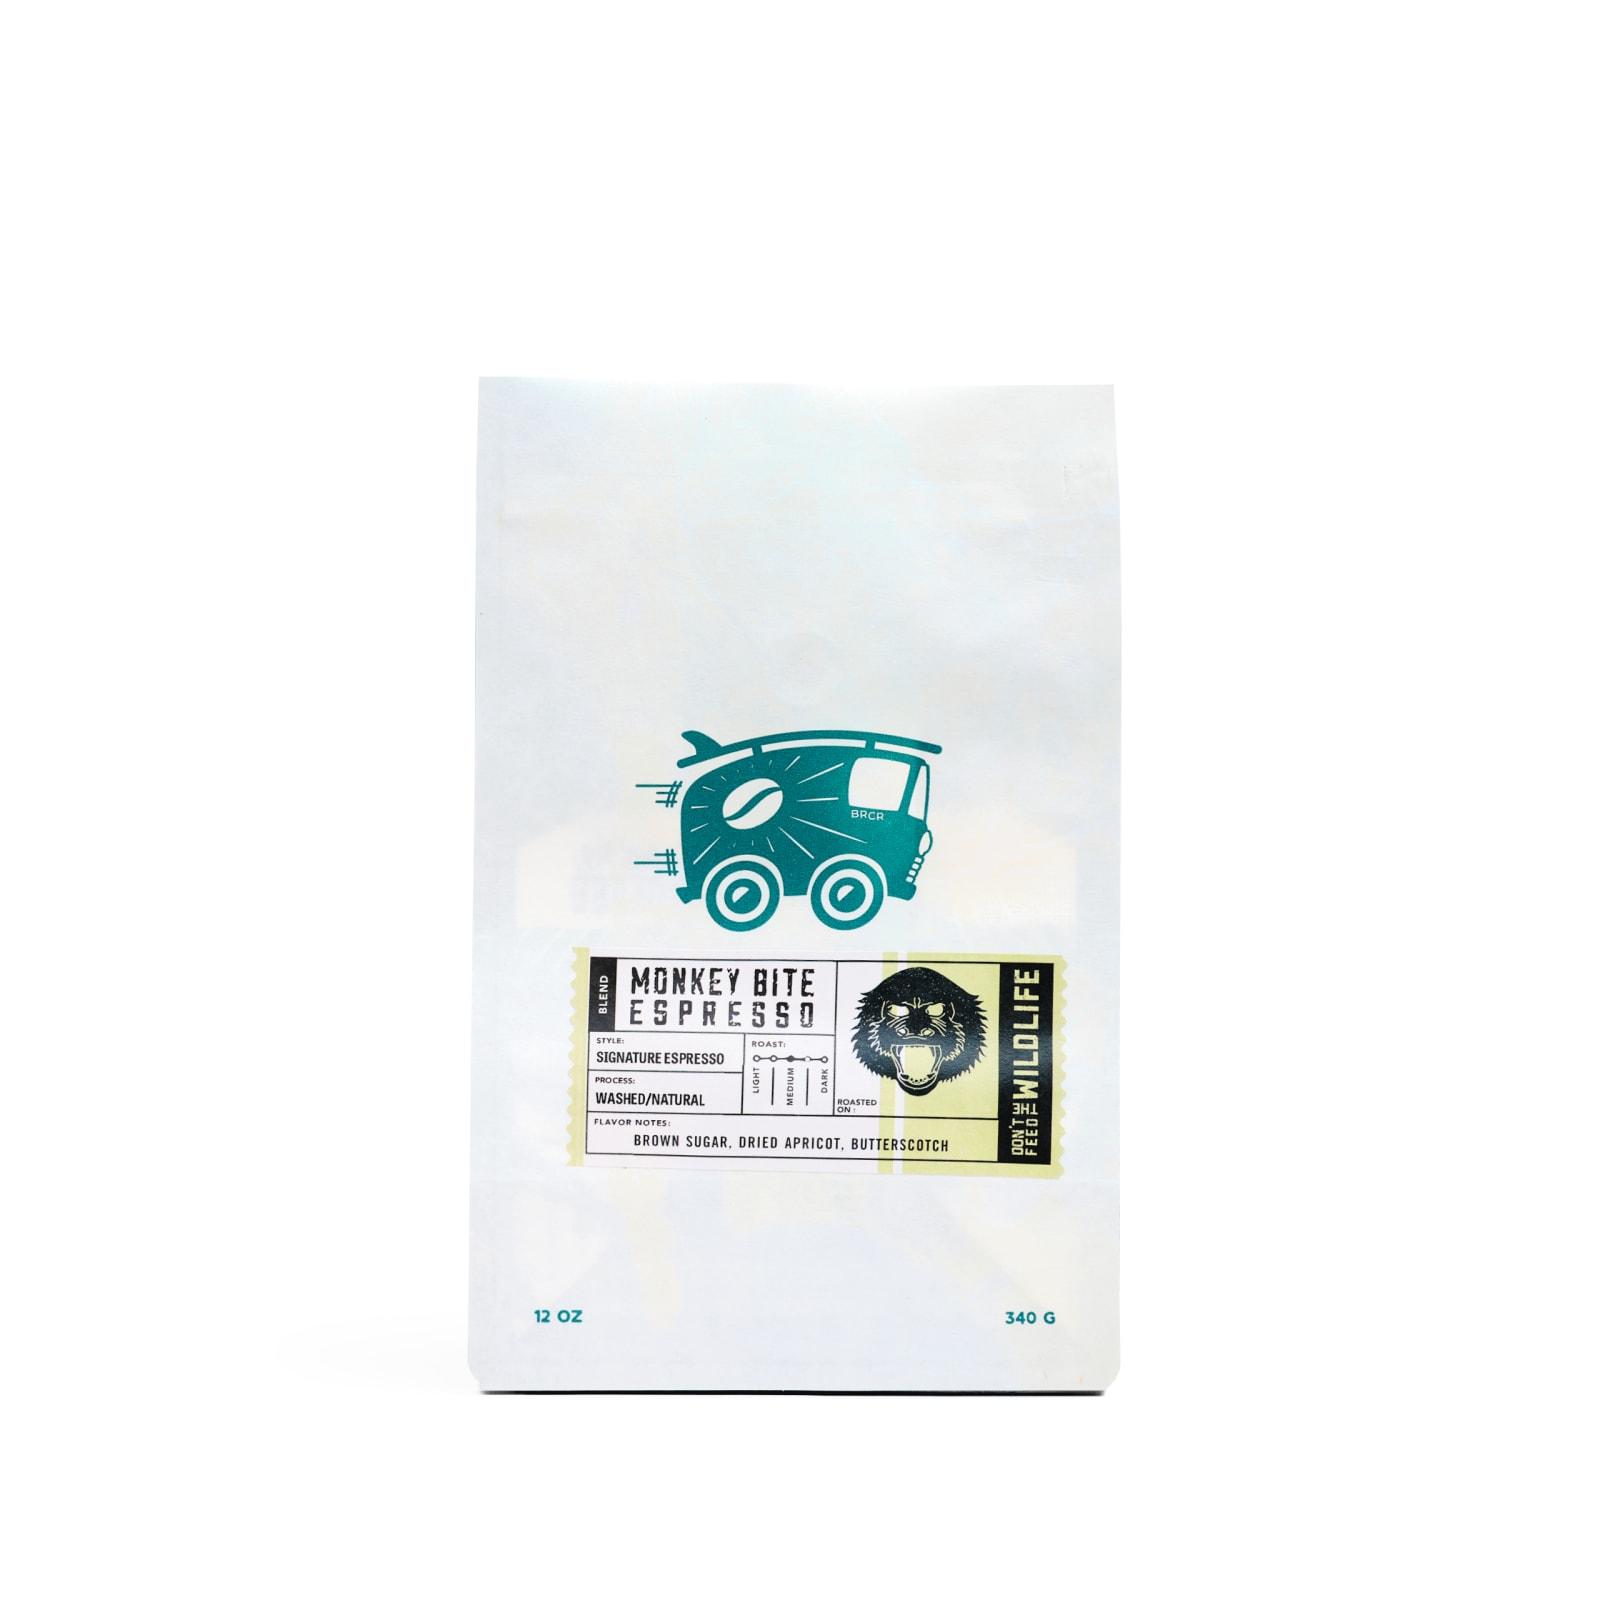 Monkey Bite Espresso